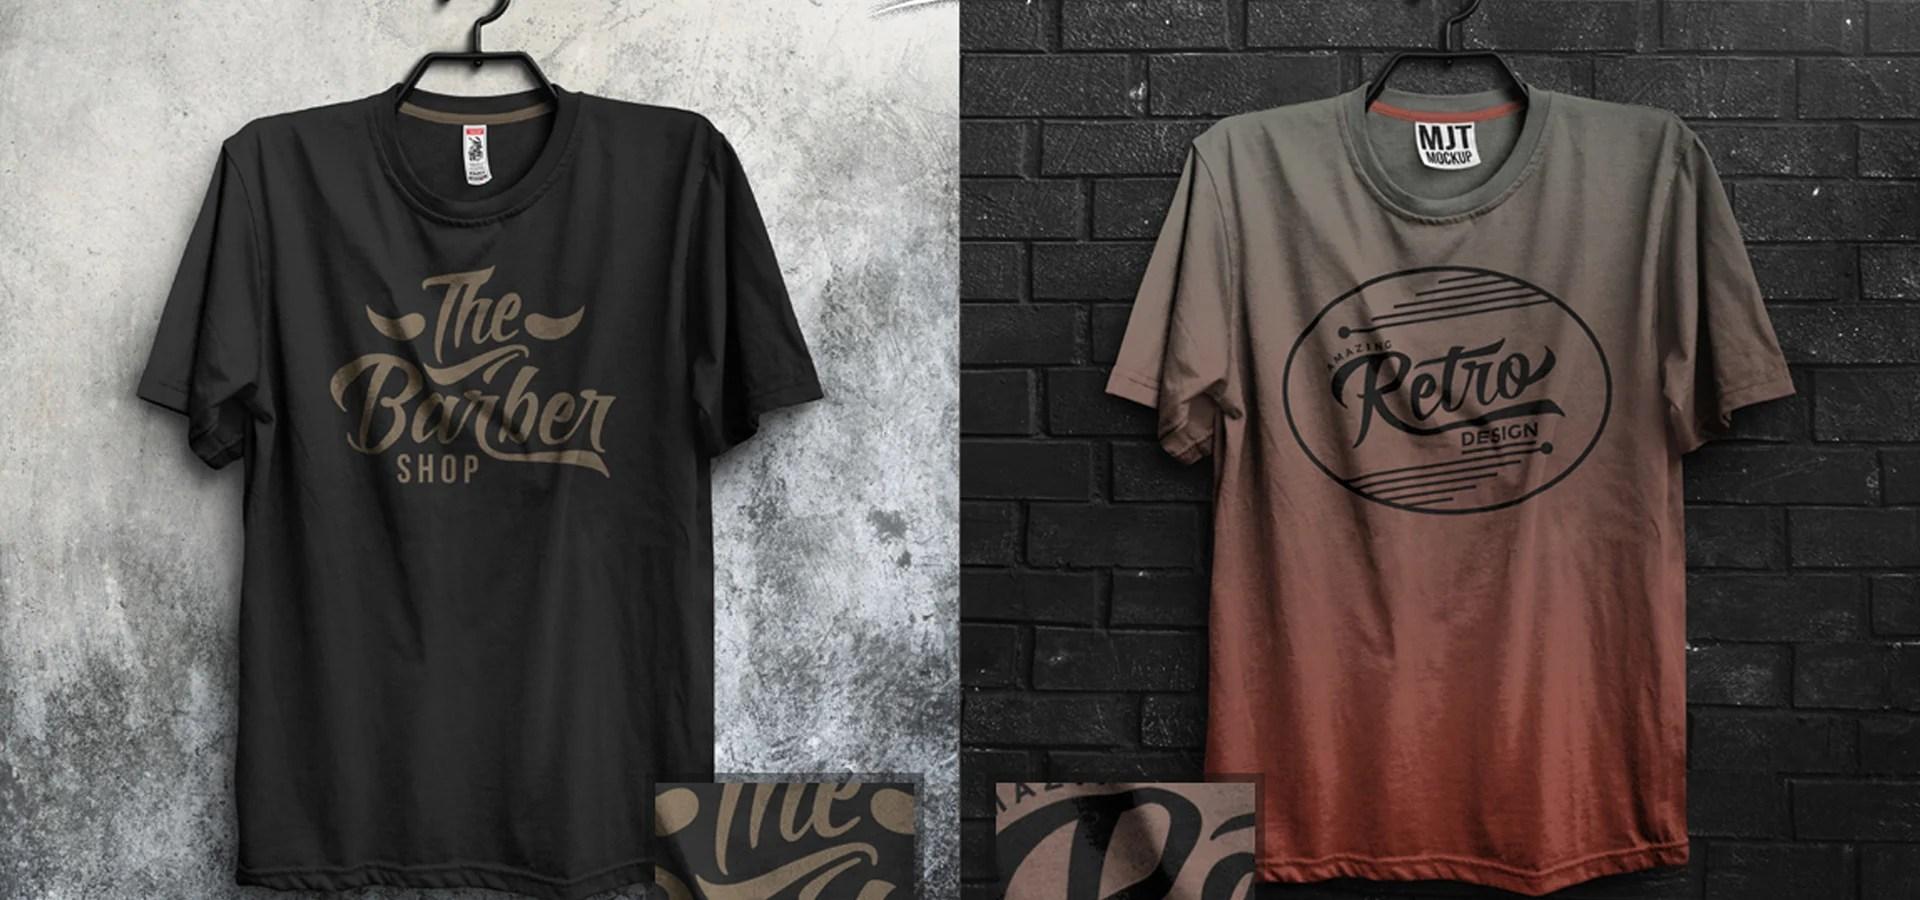 26 Free Psd T Shirt Mockups For Designers Free Premium